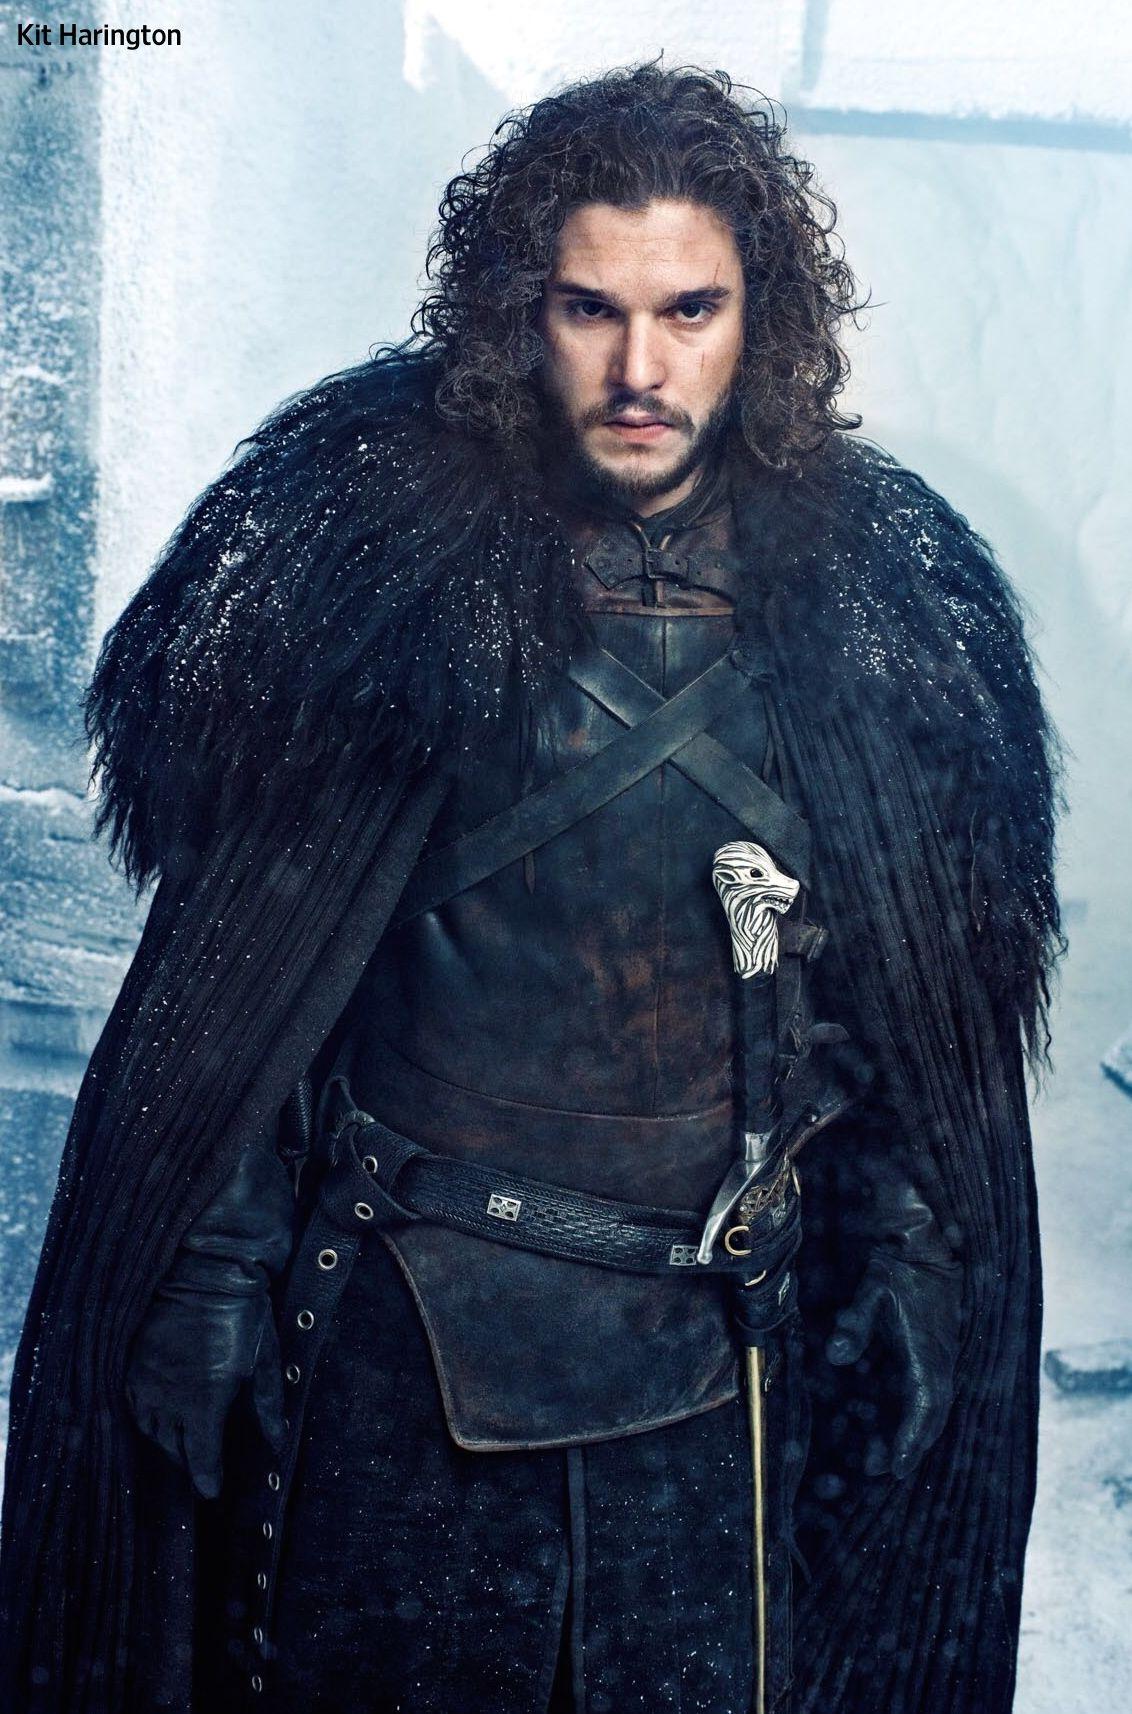 Jon Snow  | Pics Photos - Jon Snow From Game Of Thrones Adobe ...